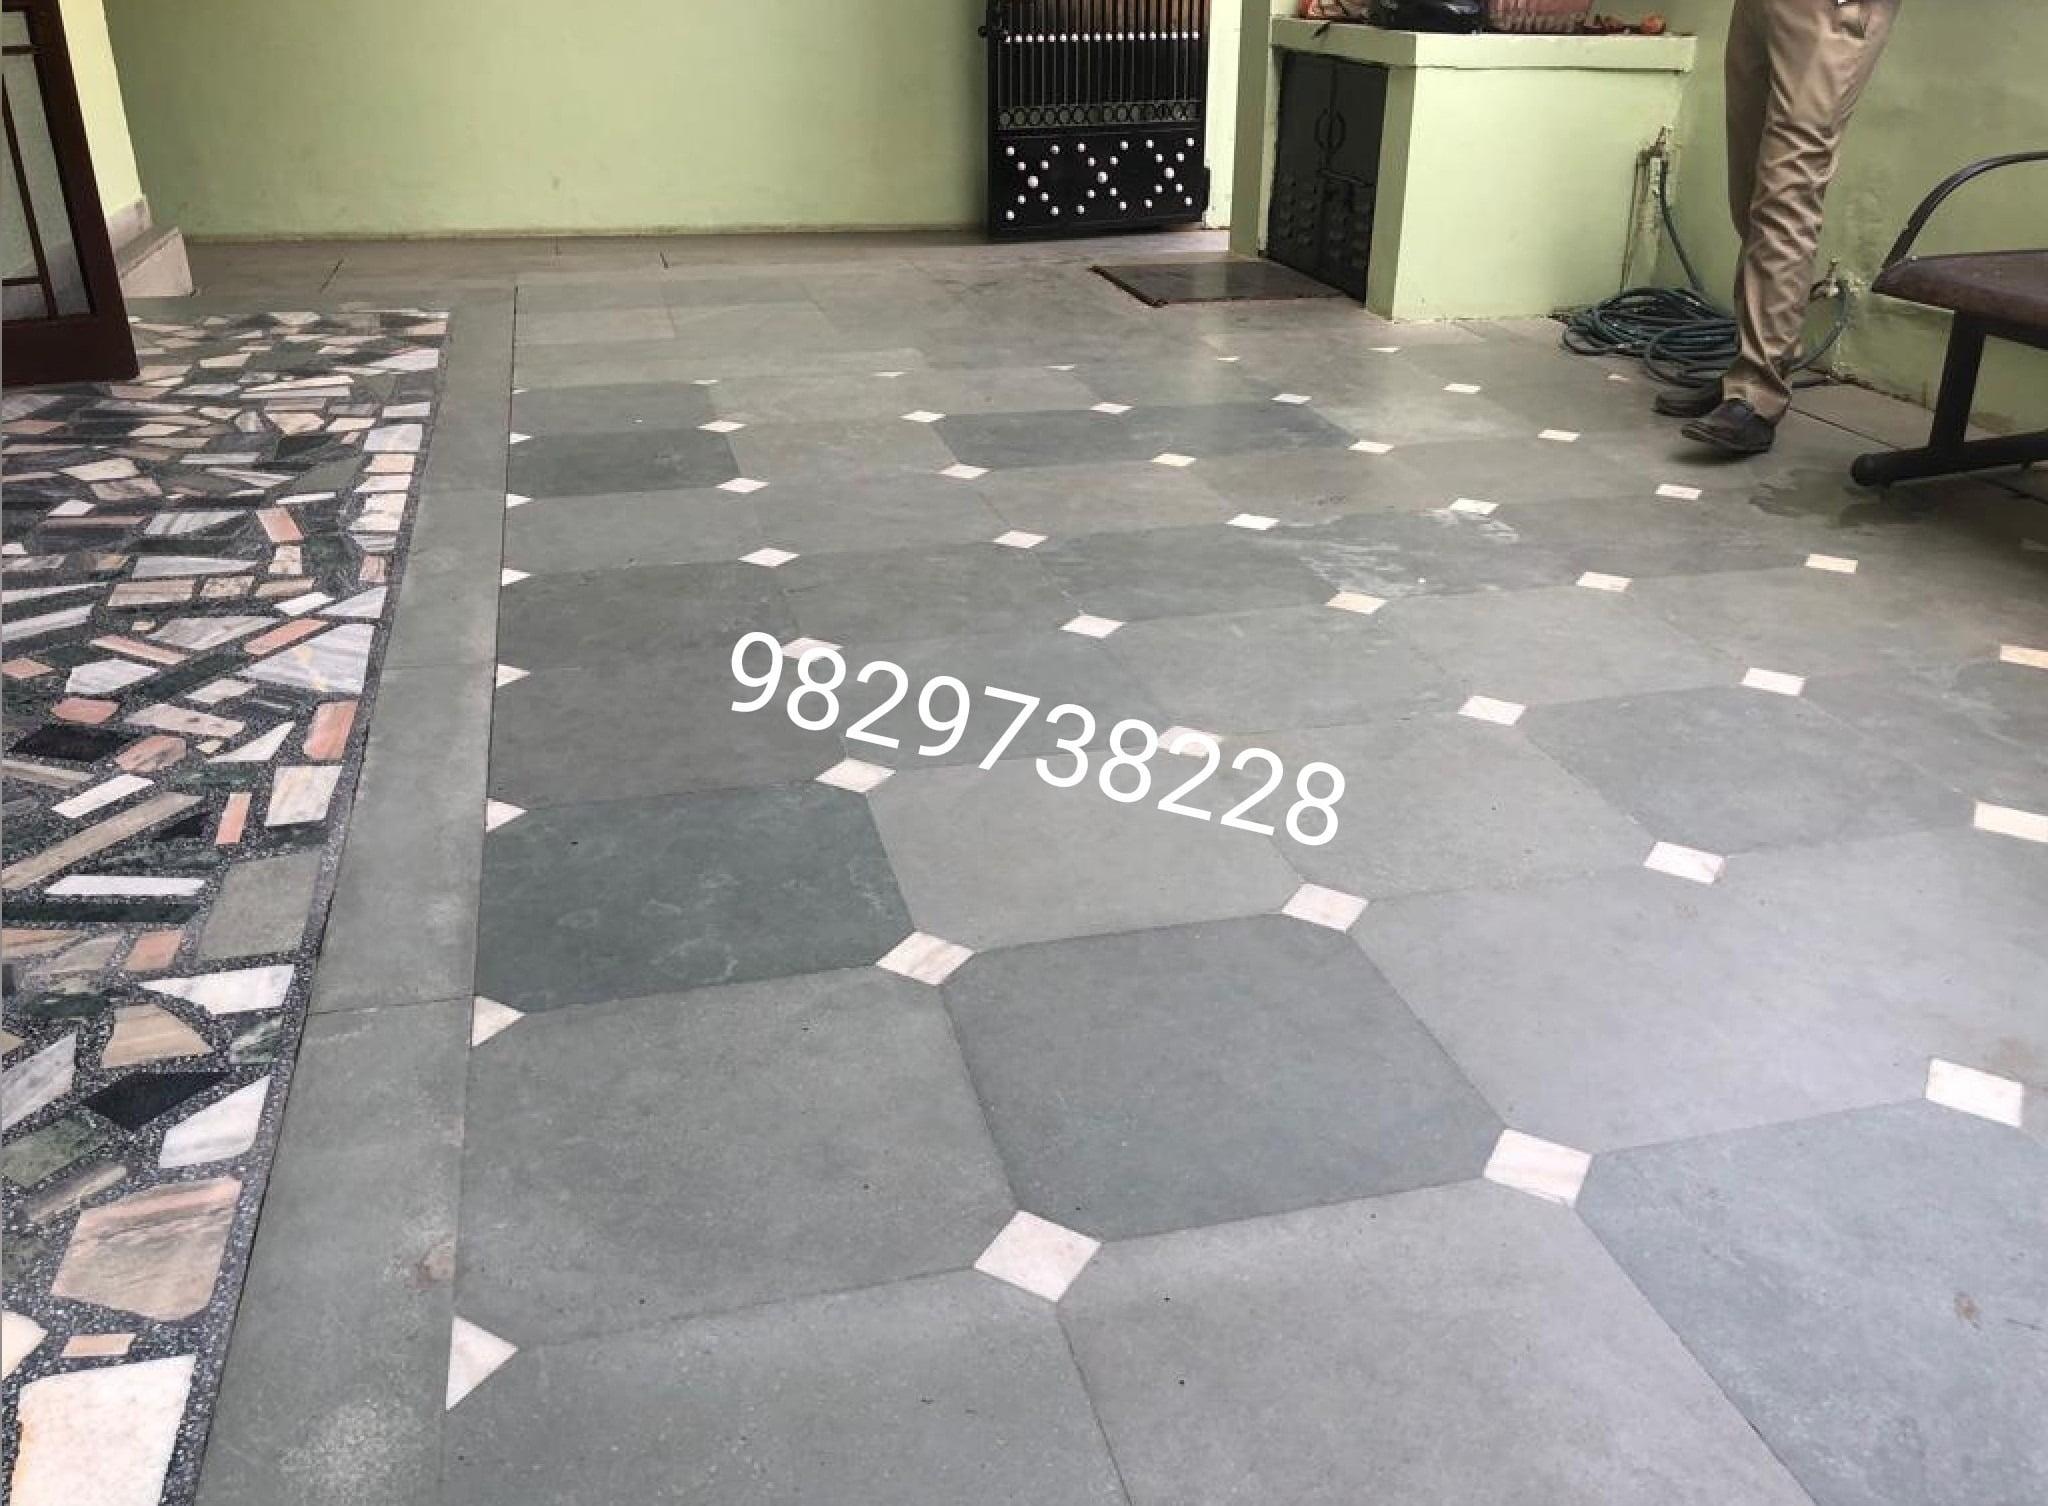 Kota Stone stone flooring design | Kota stone flooring ...